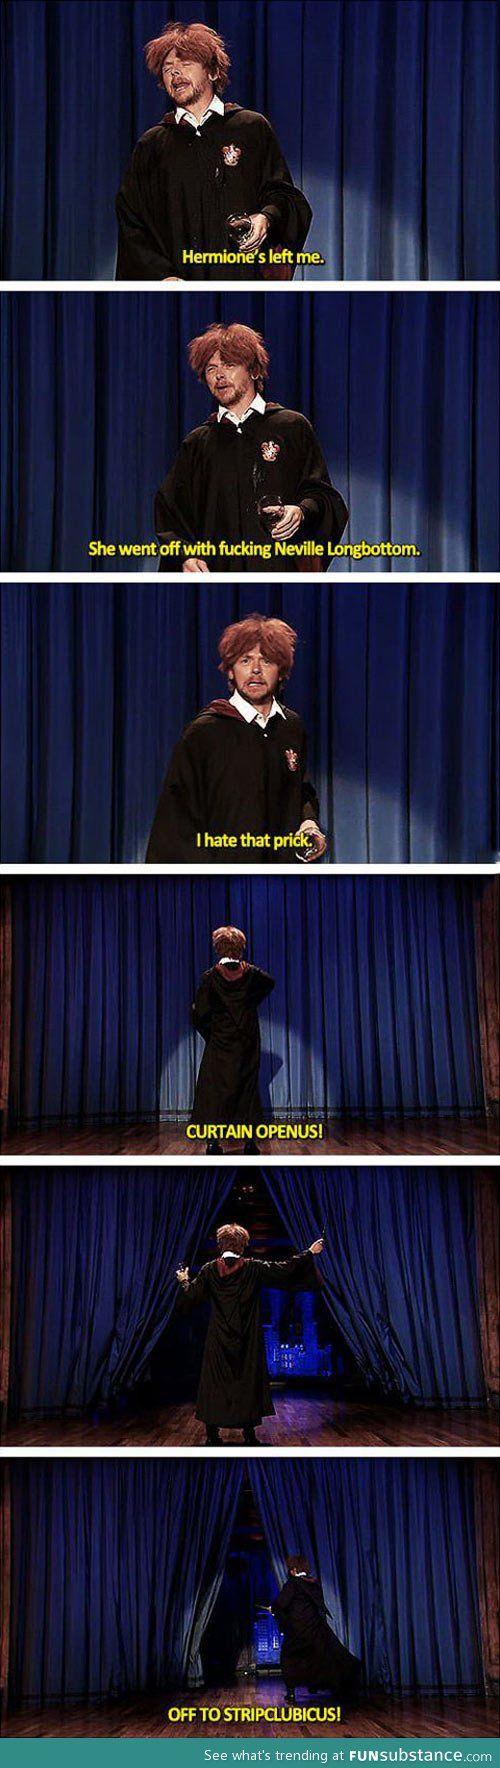 Simon Pegg as Ron Weasley - because Simon Pegg is awesome!